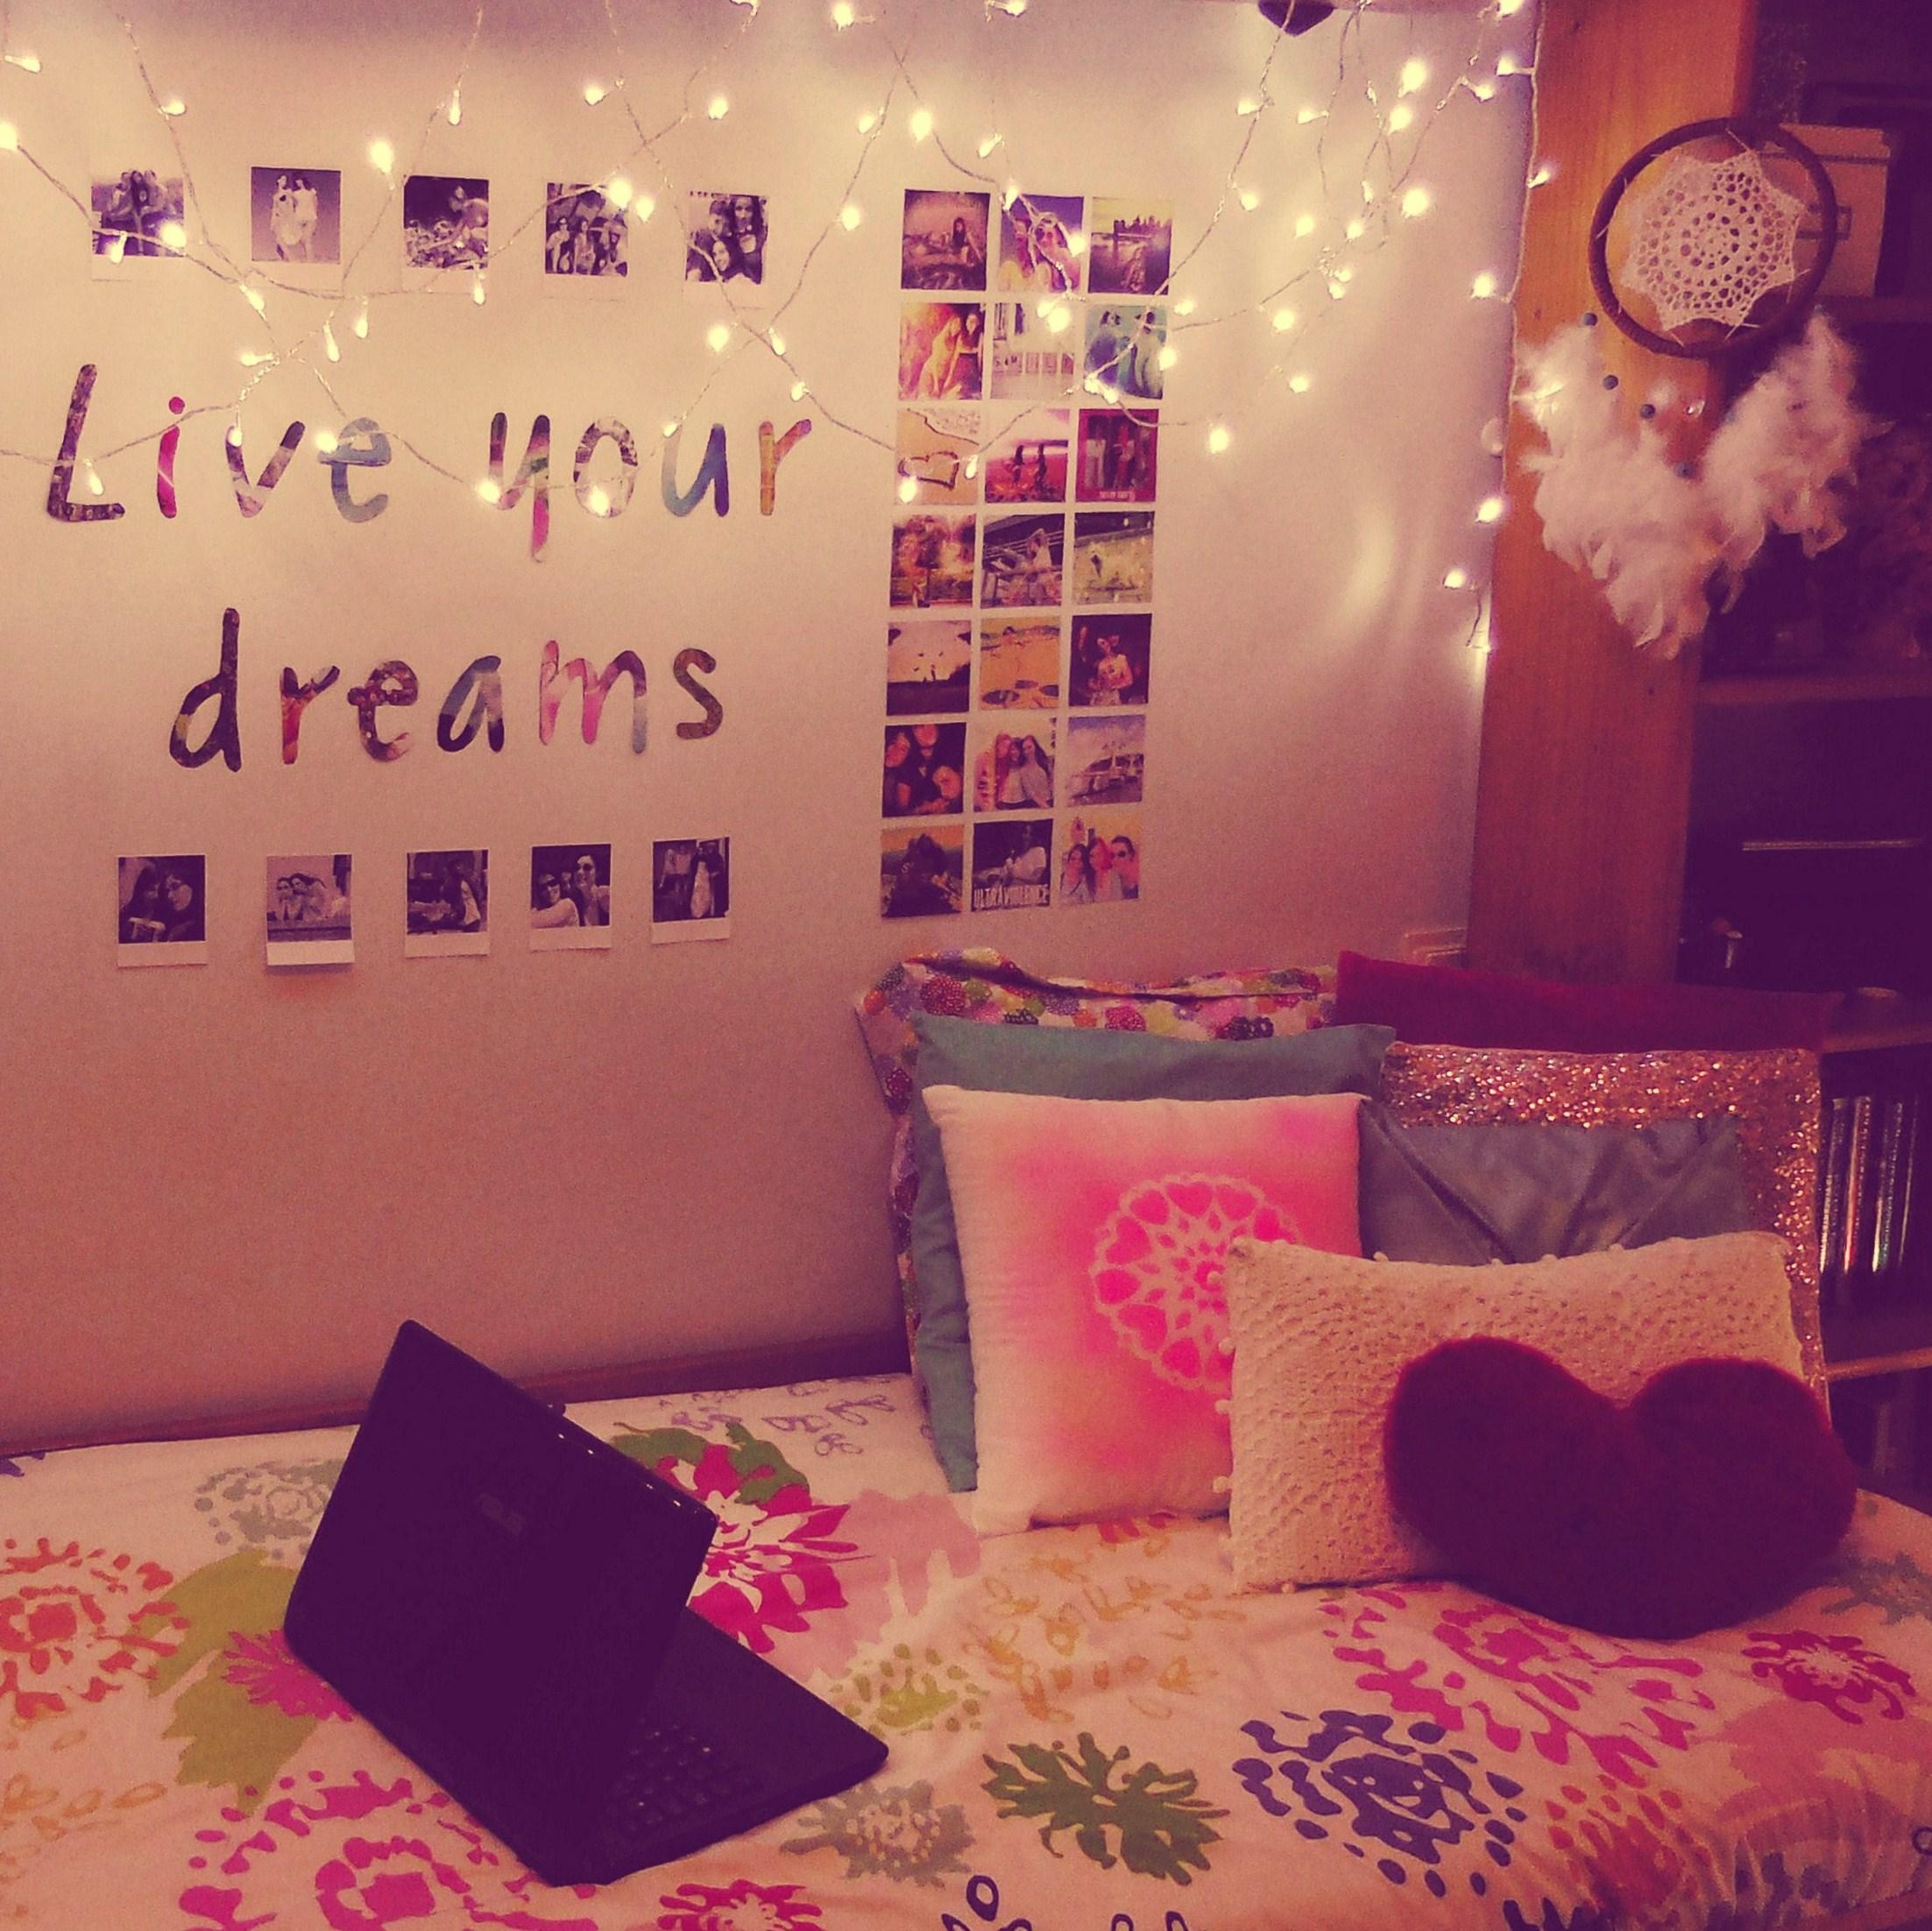 DIY Tumblr Inspired Room Decor Ideas! Easy & Fun ... on Room Decor Tumblr id=22127